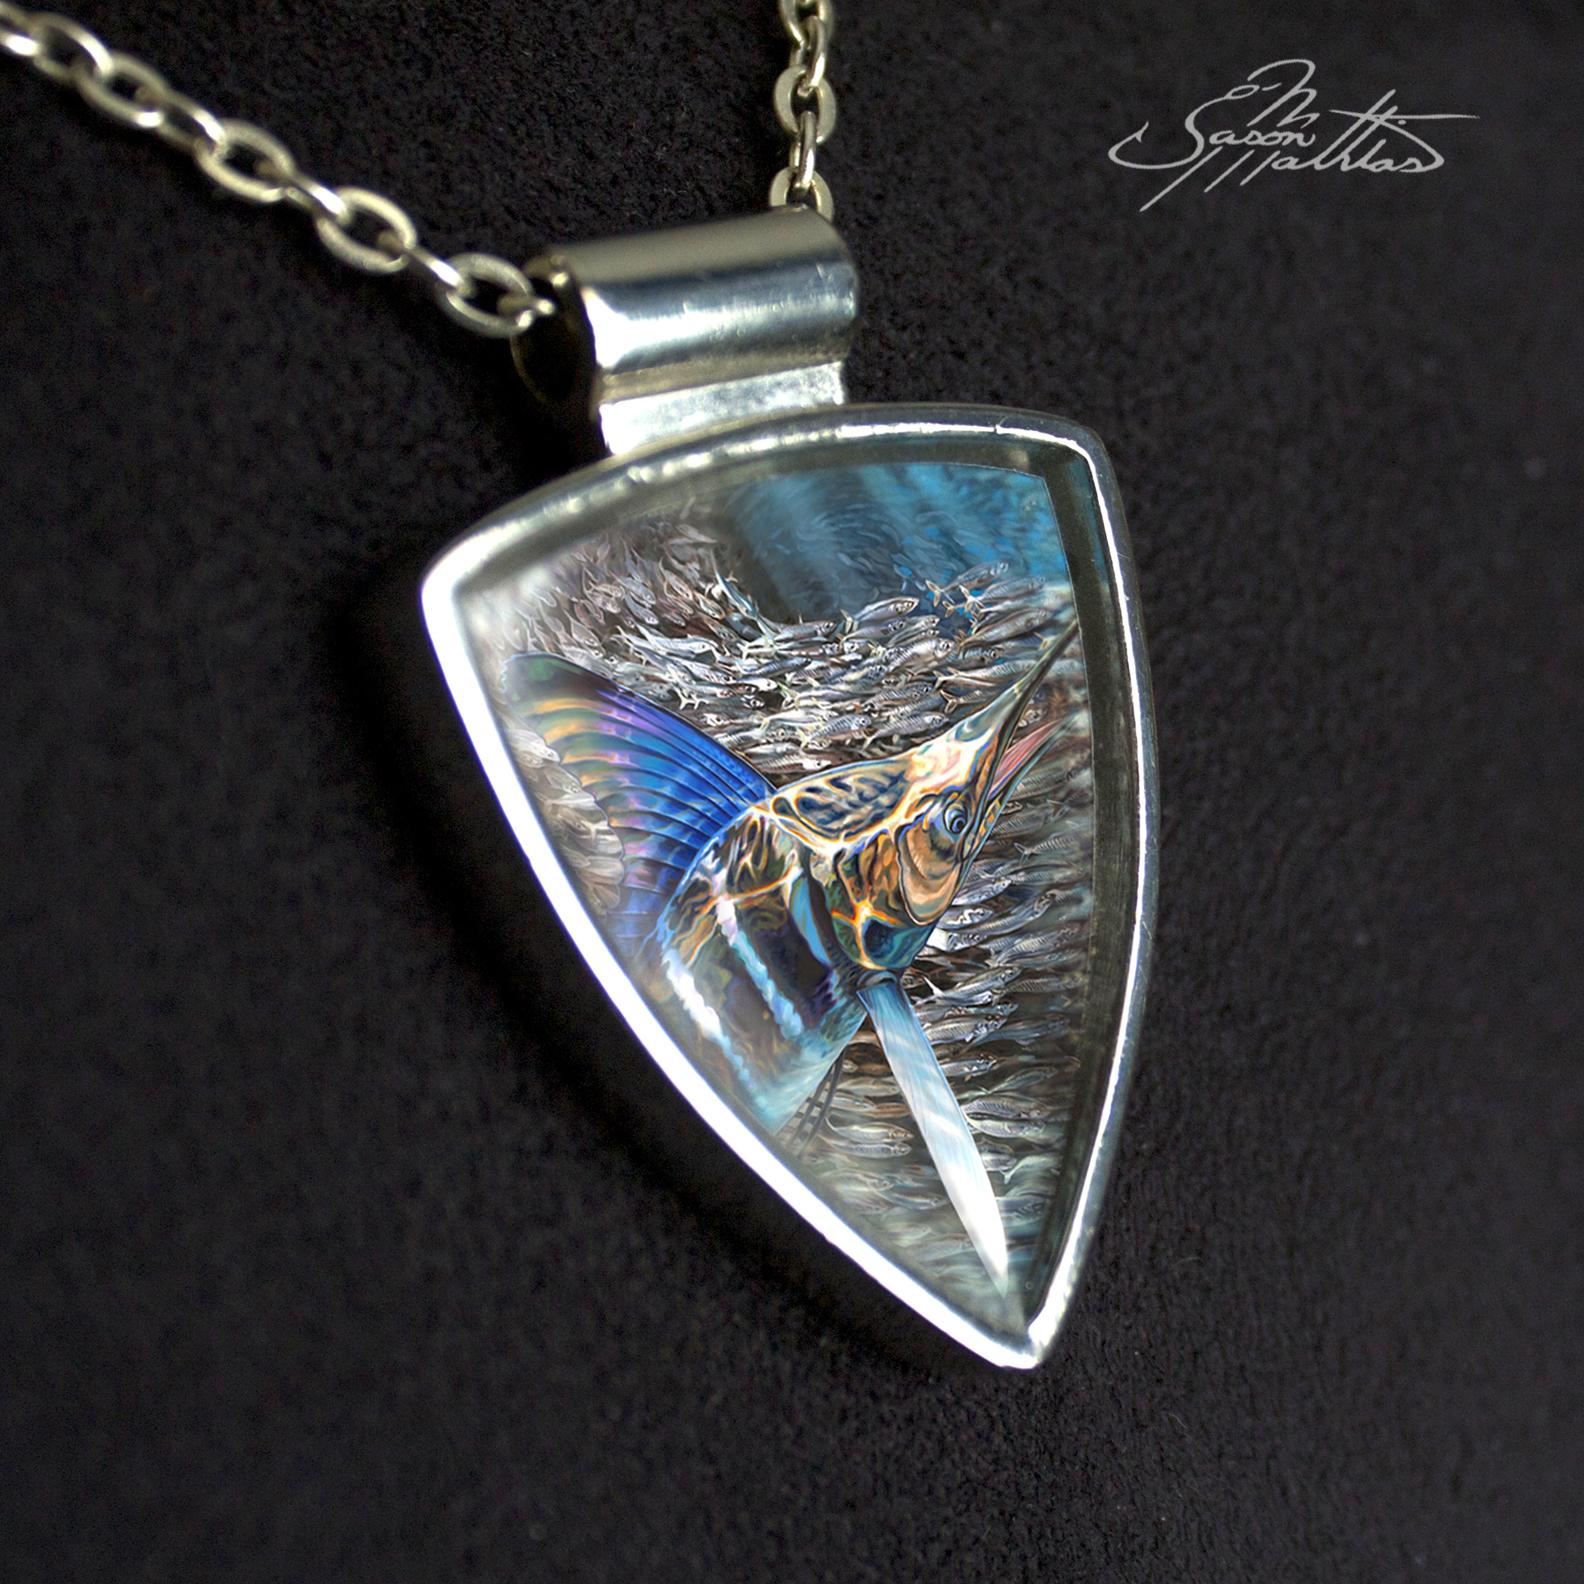 marlin-necklace-pendant-jewelry-jason-mathias.jpg